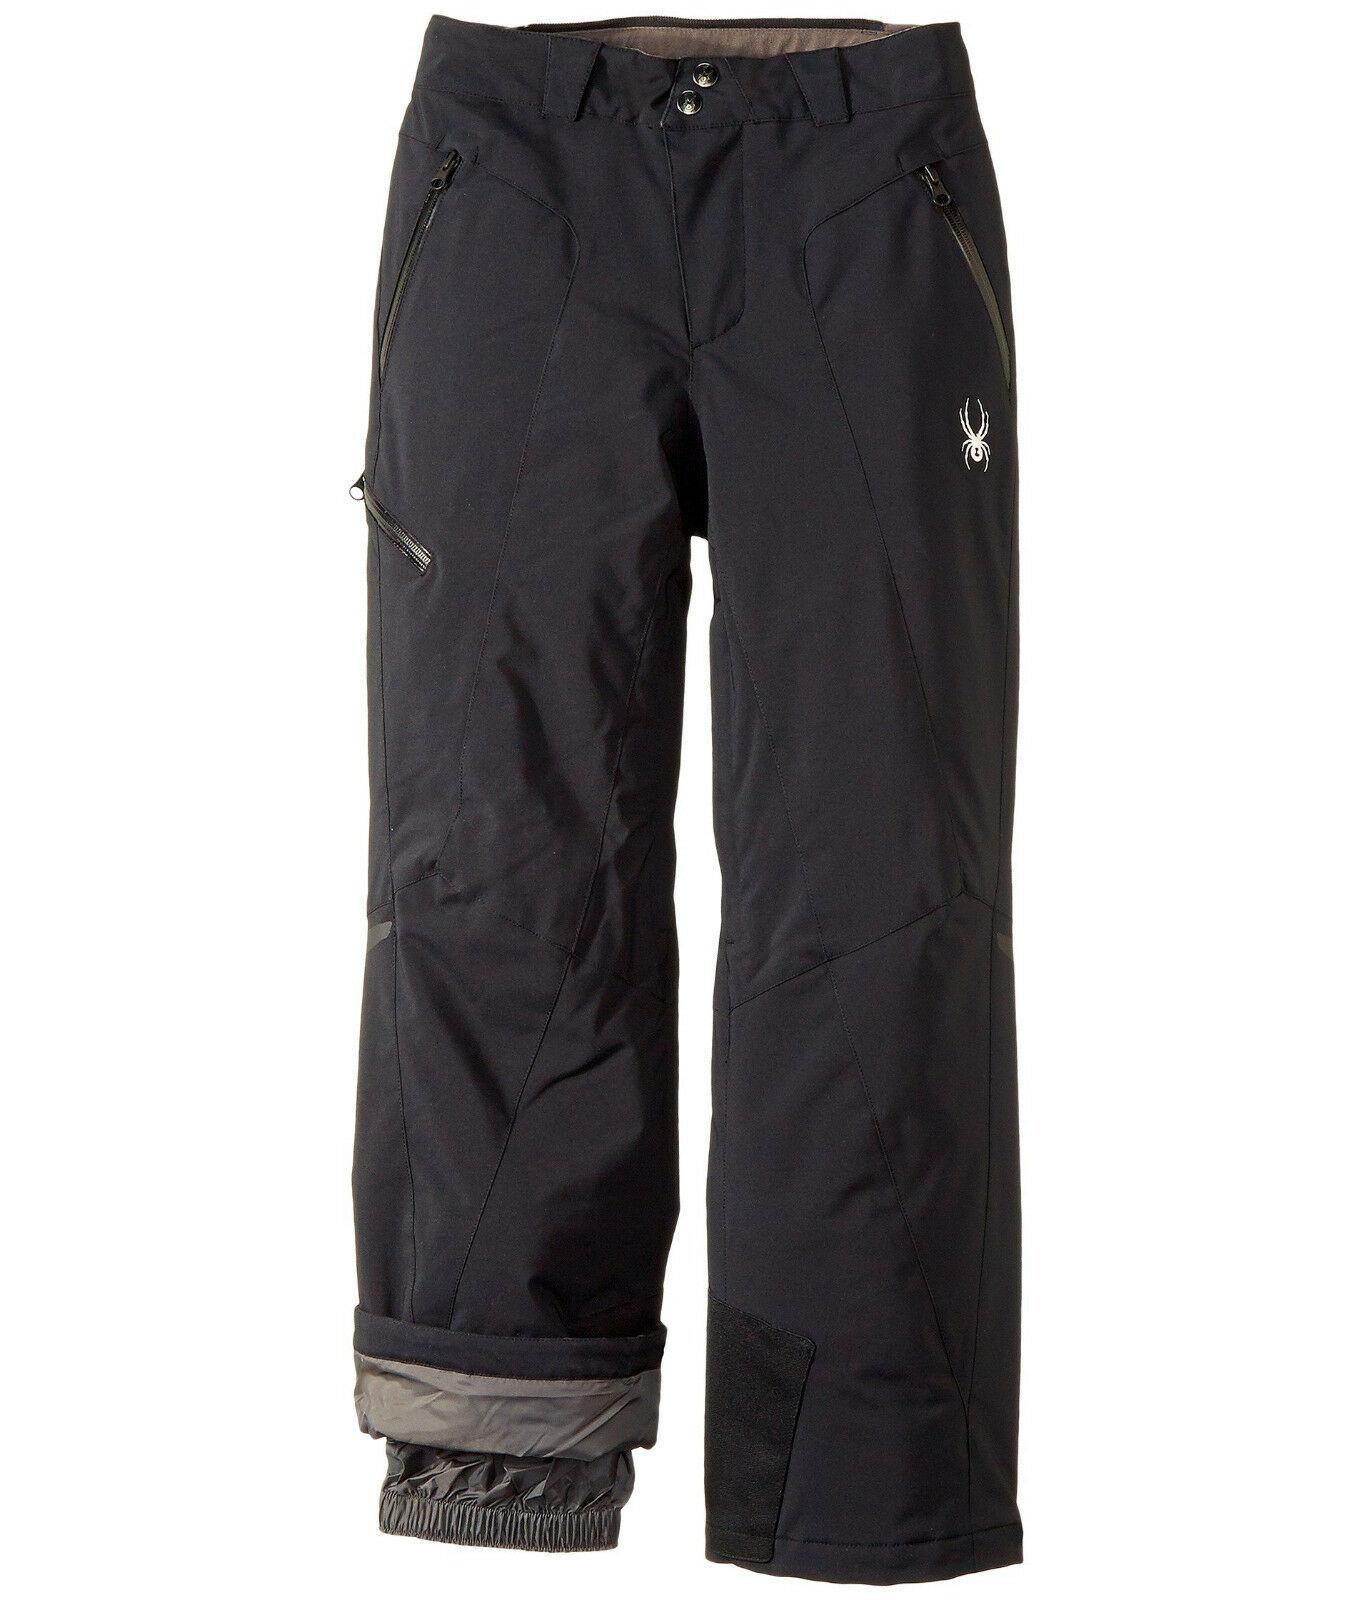 Spyder Boy's Bormio Pants, Kids Ski Snowboarding Pant, Size 10, NWT